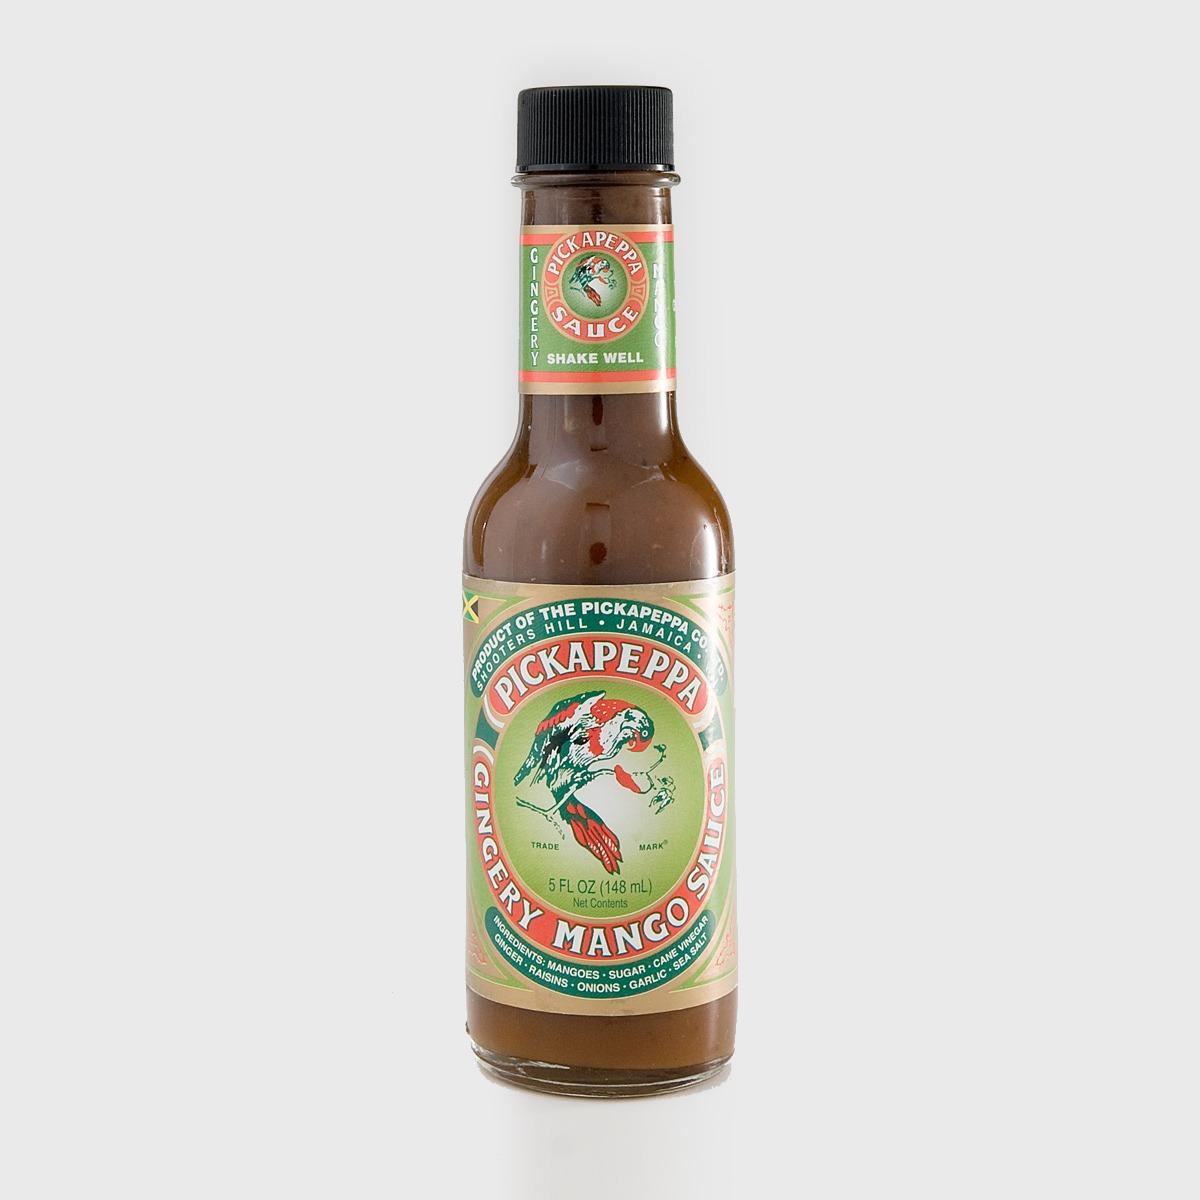 hottest hot sauces - Pickapeppa Gingery Mango Hot Sauce